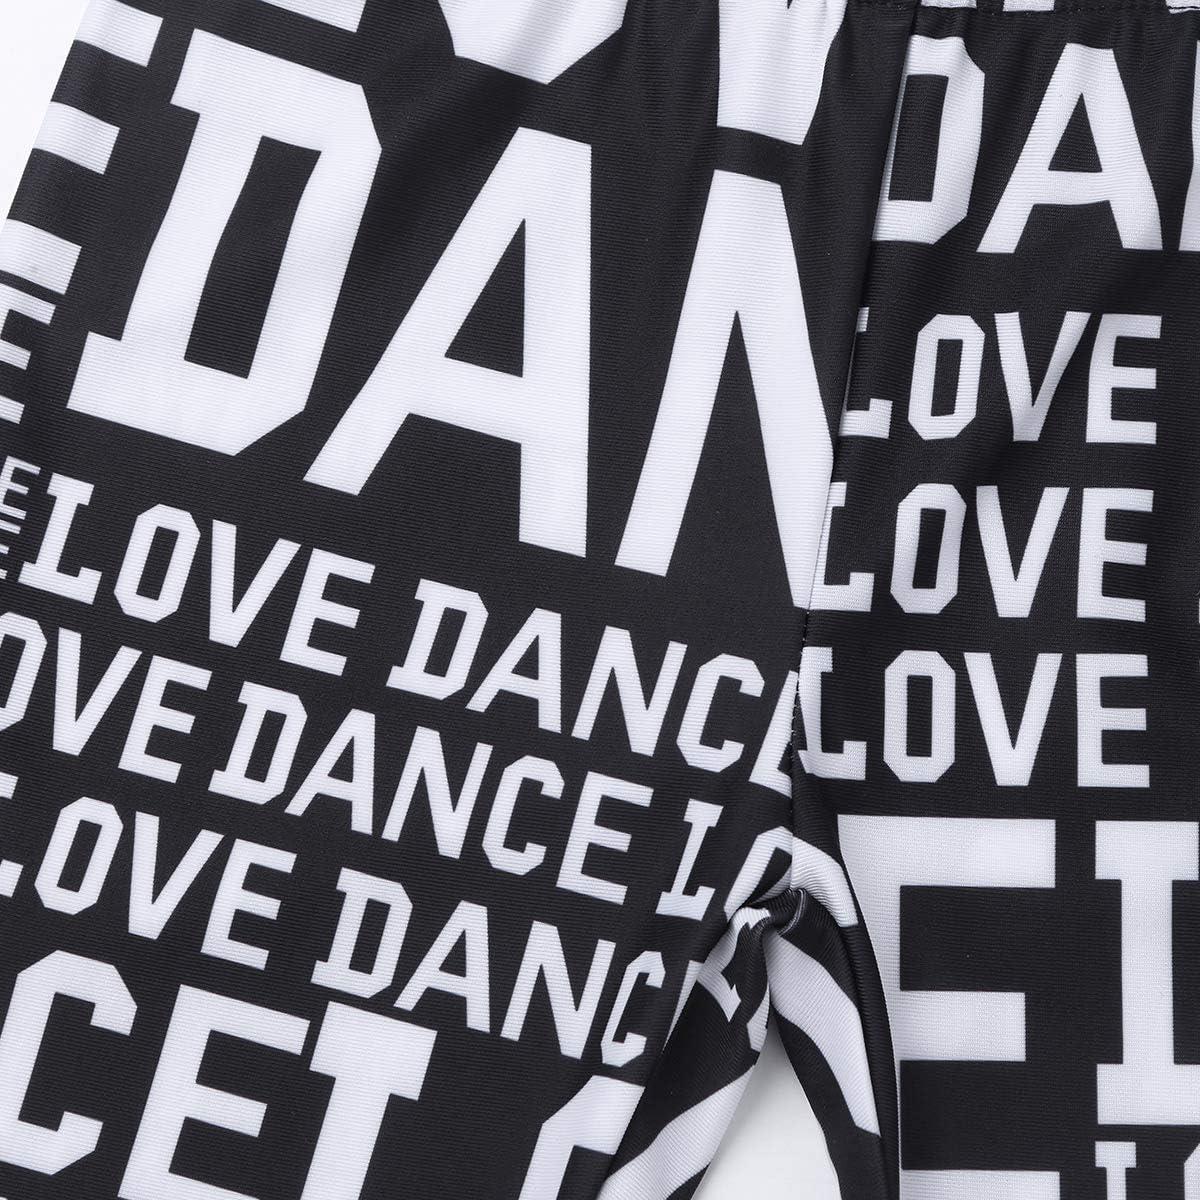 iiniim Sujetador Deportivo Double Correra Cruzada para Ni/ña Crop Top Brillante Bra Push Up para Baile Danza Gimnasia Fitness Ropa Interier sin Costura Respirable sin Aros Relleno